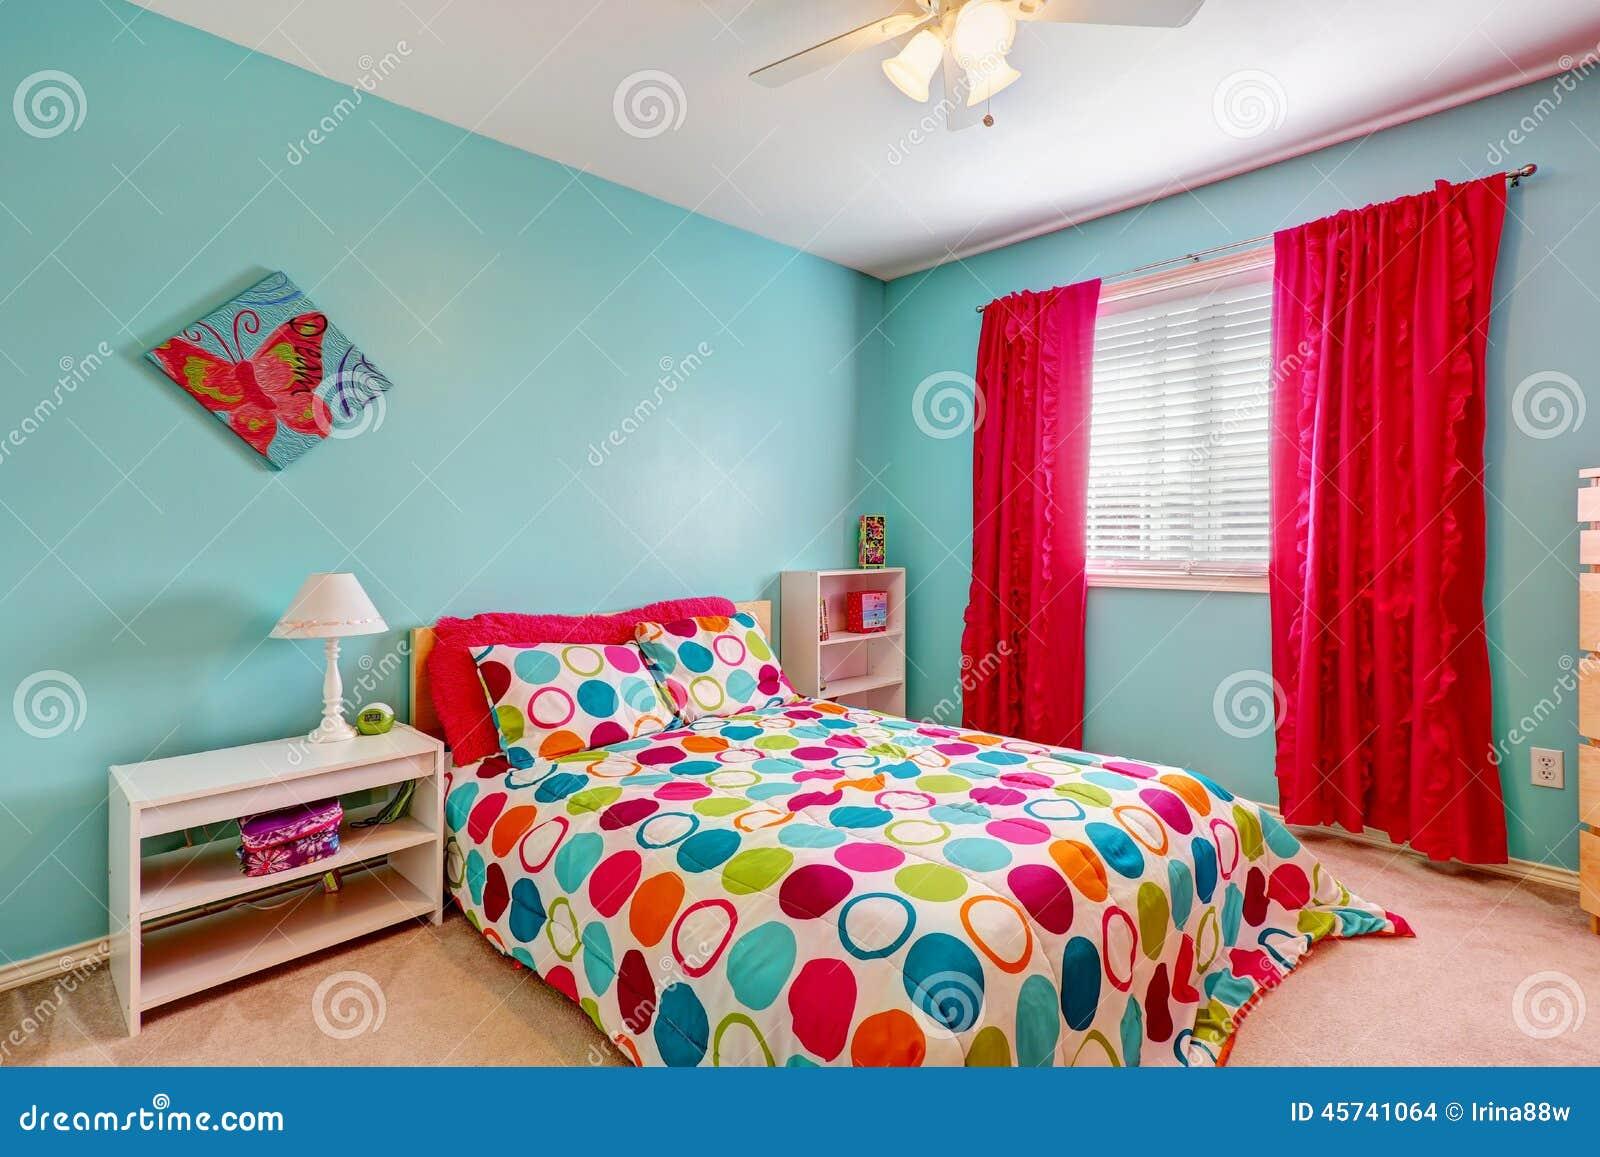 Interior alegre do quarto na cor de turquesa foto de stock for Agencement de chambre a coucher